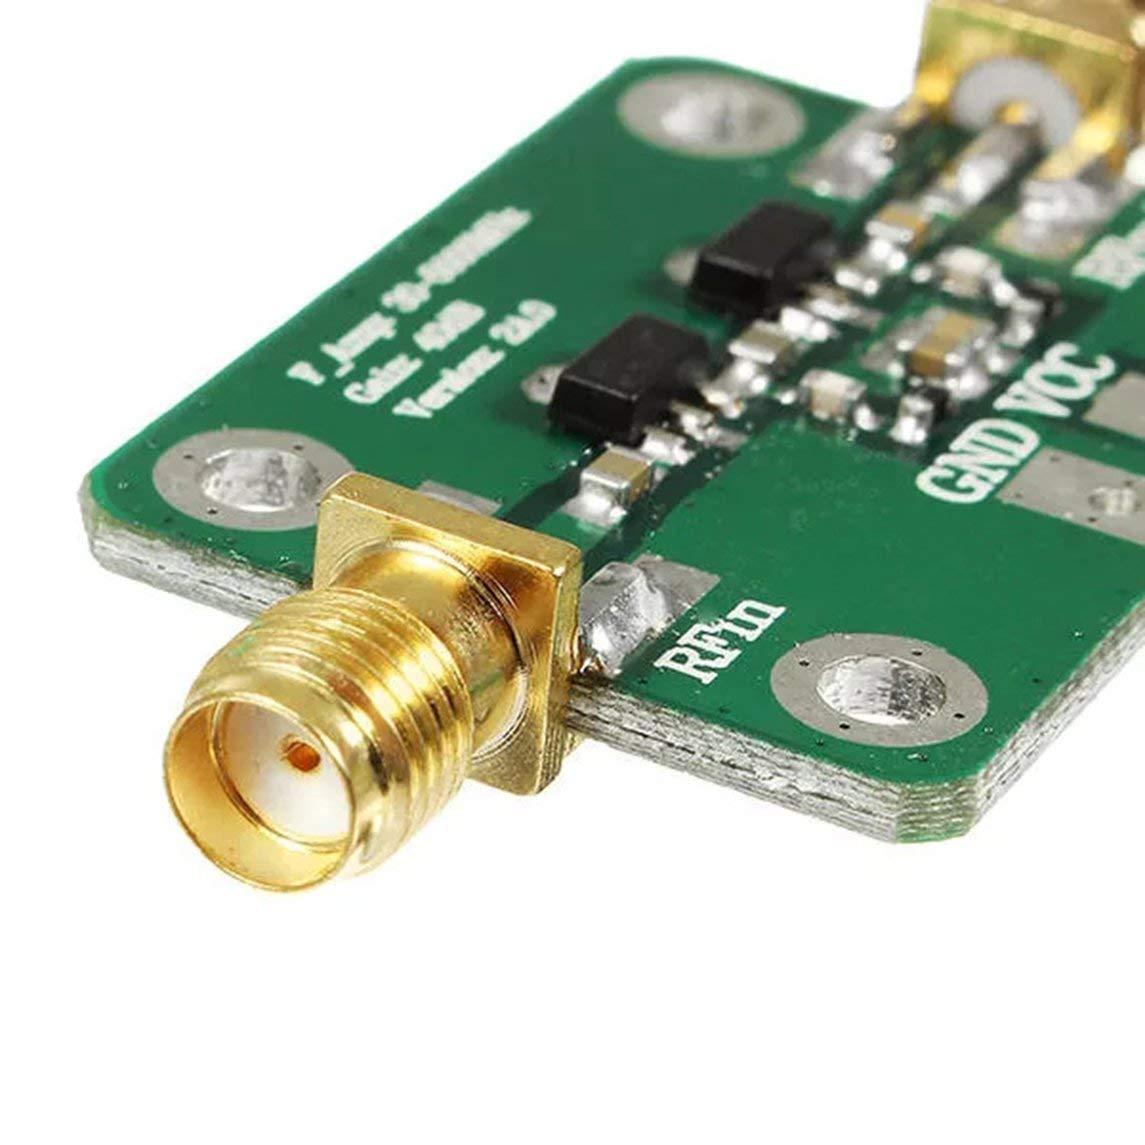 YXTFN 30-4000Mhz 40Db Gain Rf Broadband Amplifier Module for Fm Hf VHF/Uhf 50Ω UBS by Magicalworld (Image #5)